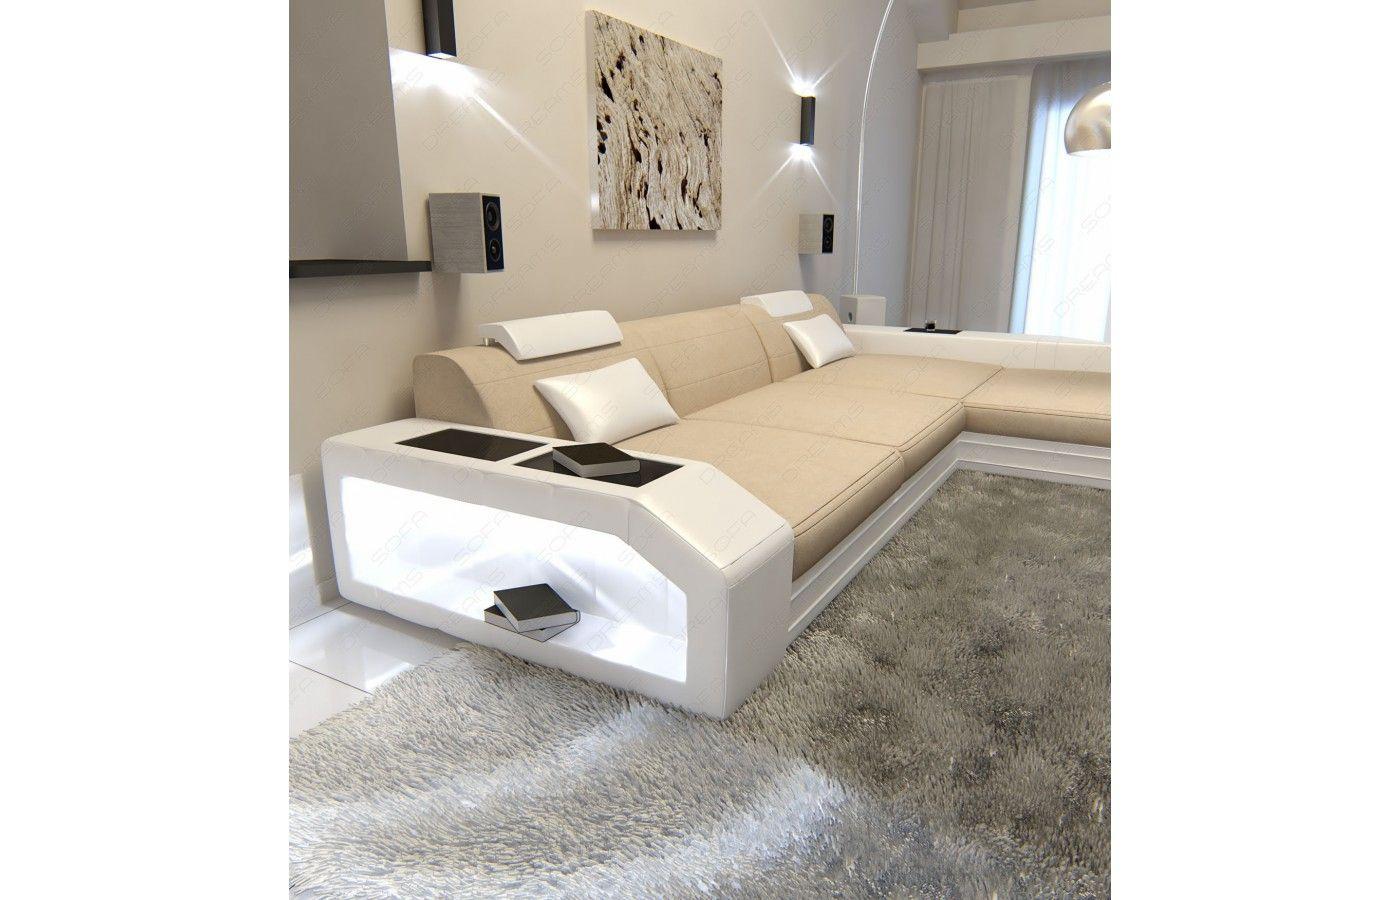 Inspirierend Sofa In L Form Beste Wahl Stoffsofa Prato L-form Beige-weiß. Iv Bei Dreams!